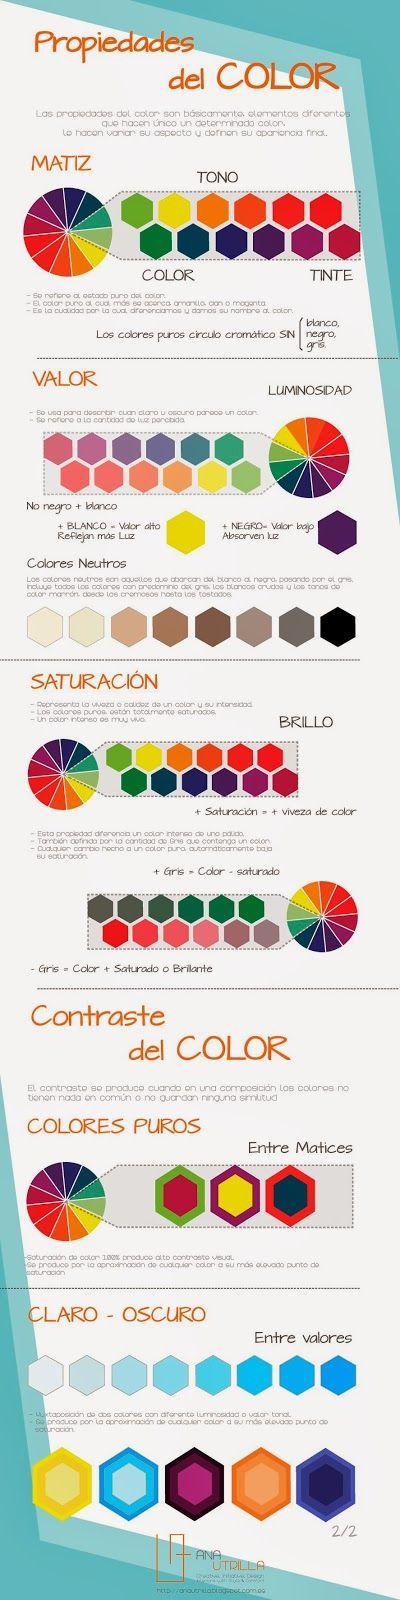 Teor a del color en dise o de interiores infograf a - Colores de interiores ...